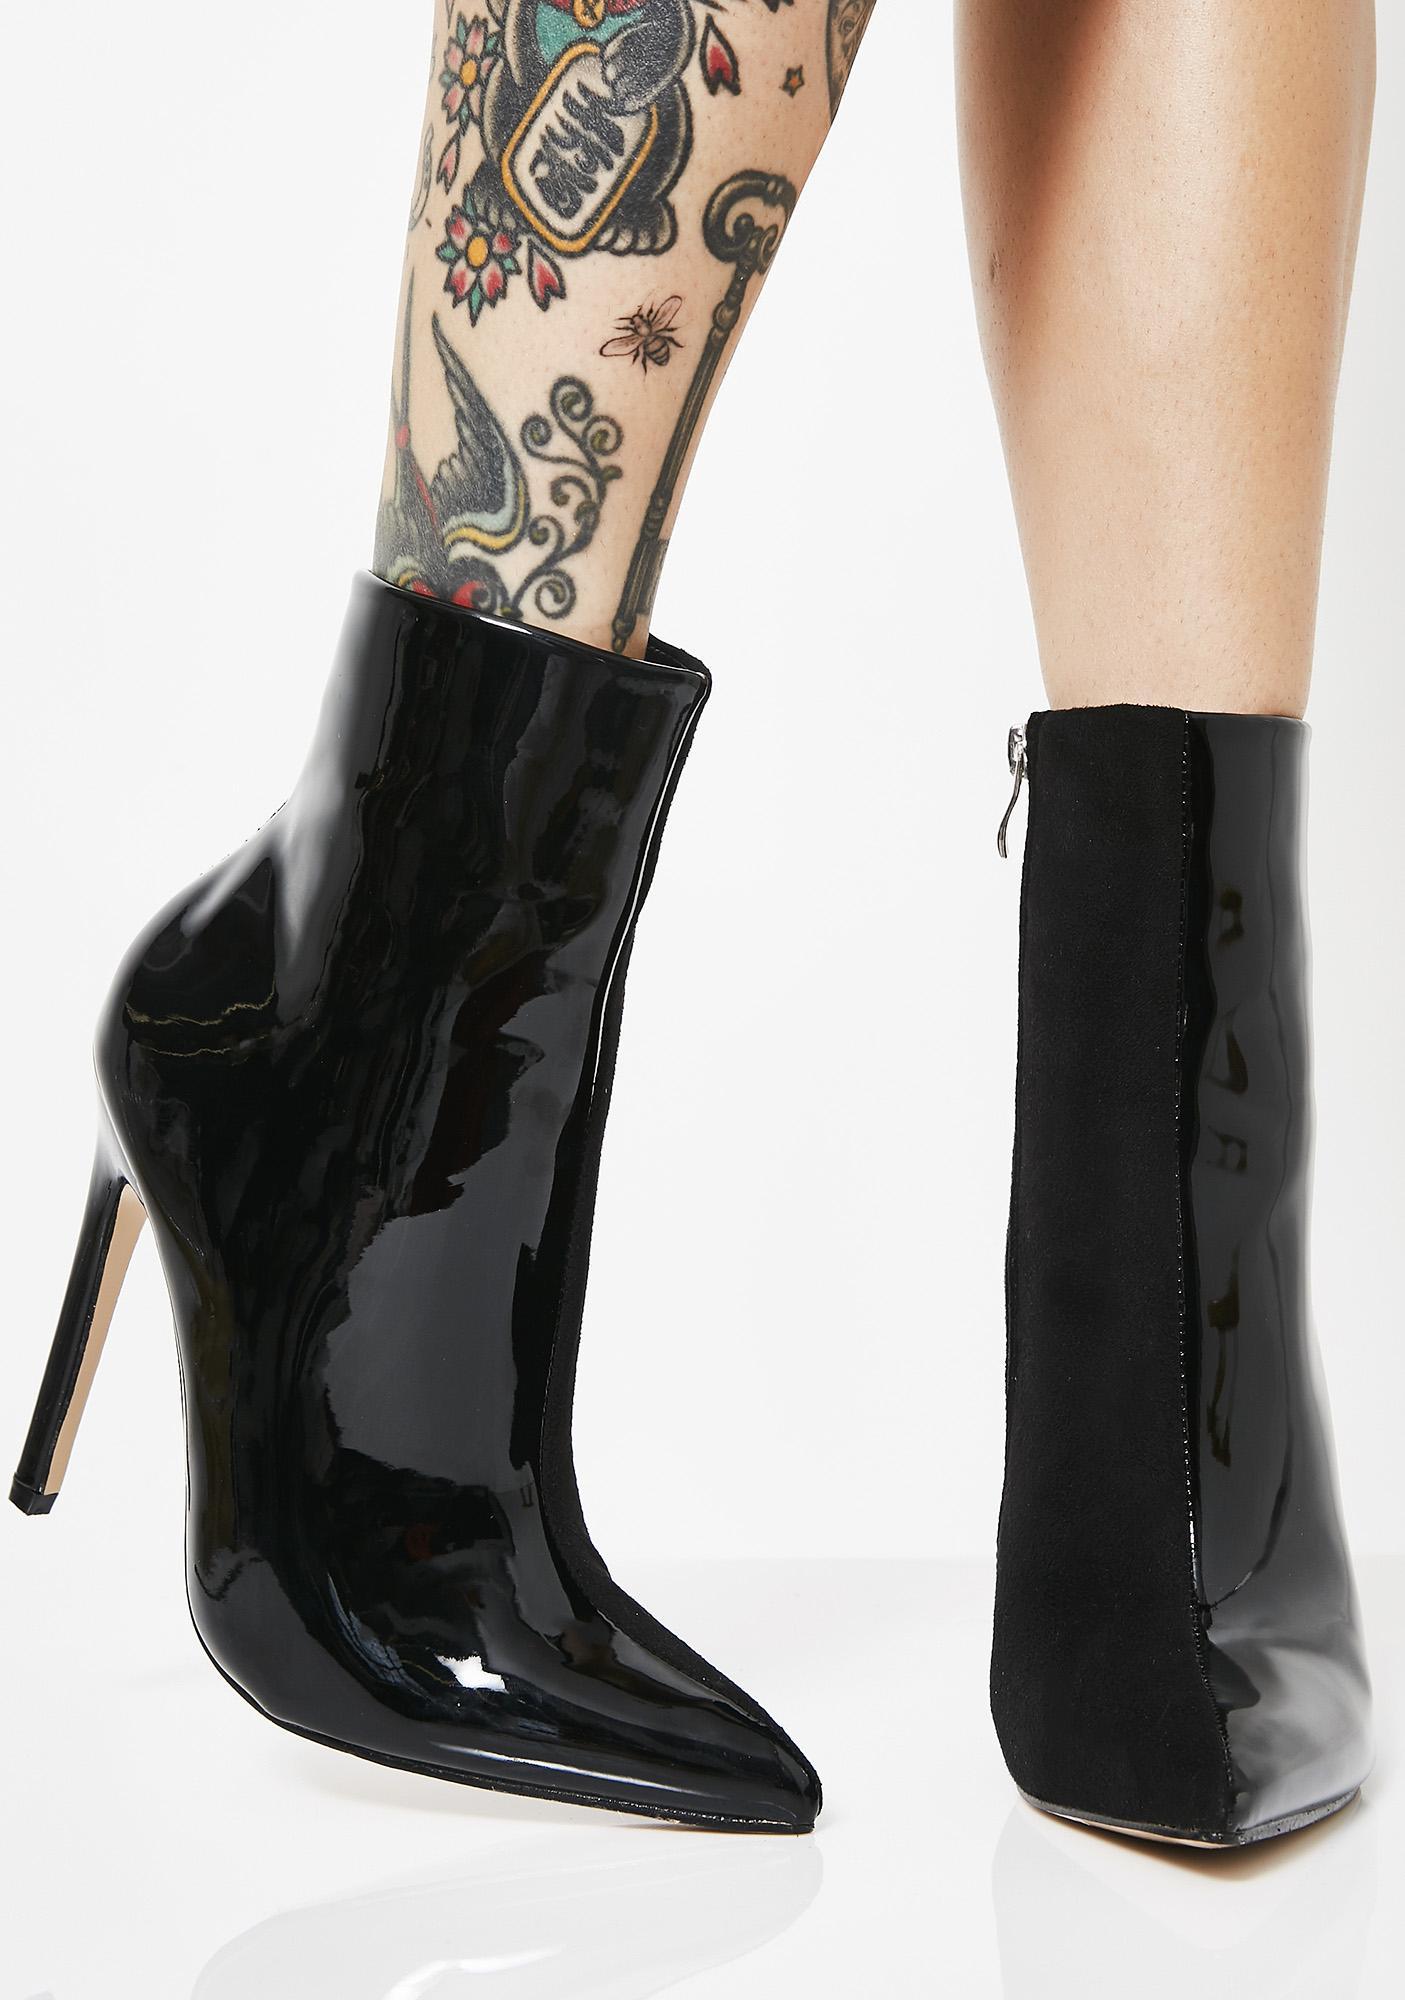 Yuri Contrast Stiletto Heel Ankle Boots by Public Desire